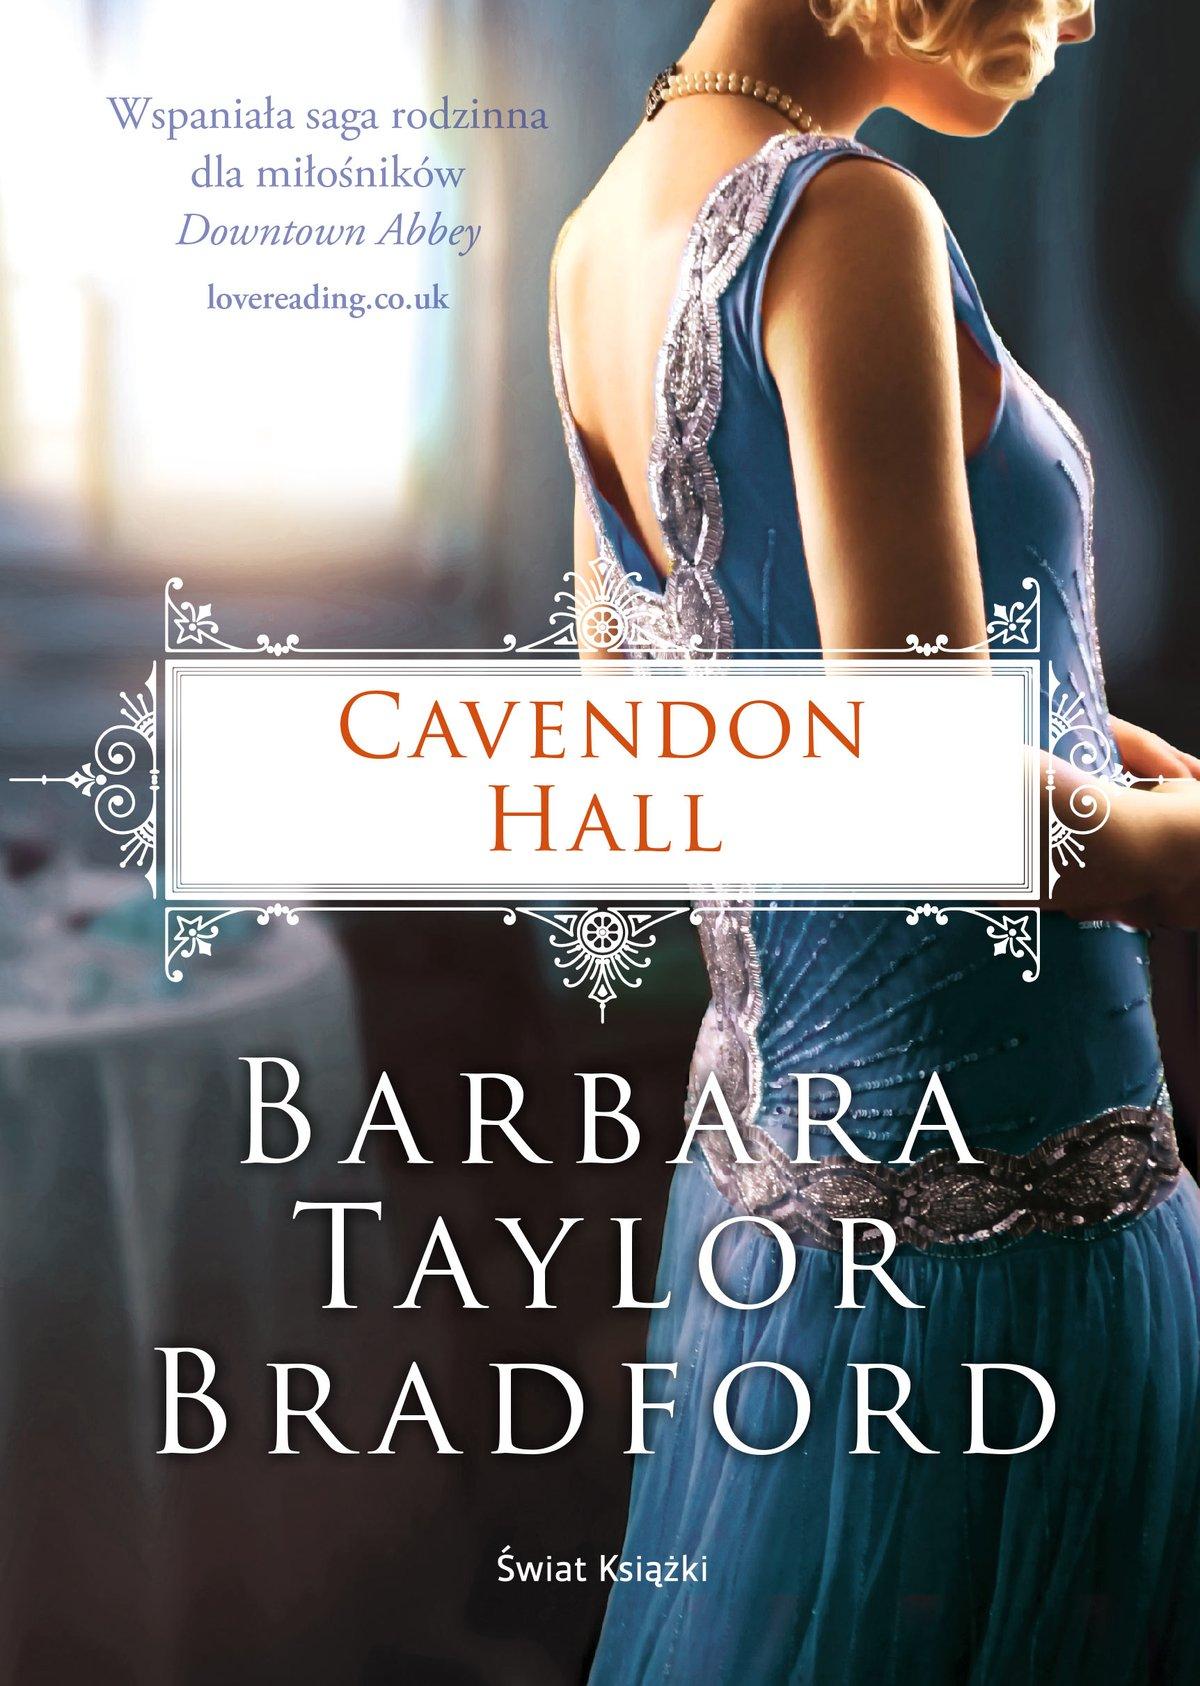 Cavendon Hall - Ebook (Książka na Kindle) do pobrania w formacie MOBI